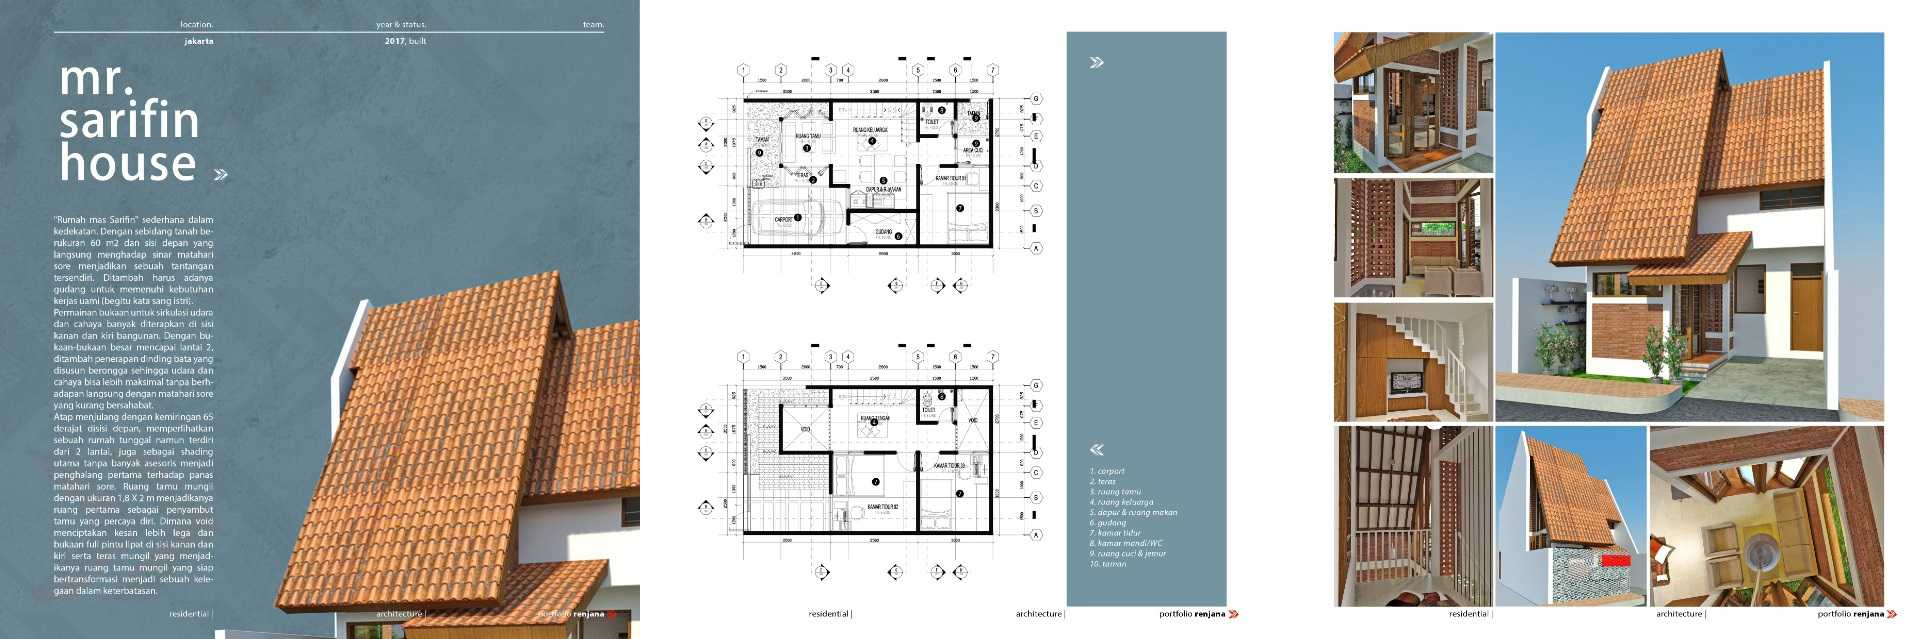 Renjana Mr. Sarifin House Kec. Ciledug, Kota Tangerang, Banten, Indonesia Kec. Ciledug, Kota Tangerang, Banten, Indonesia Renjana-Mr-Sarifin-House   99606